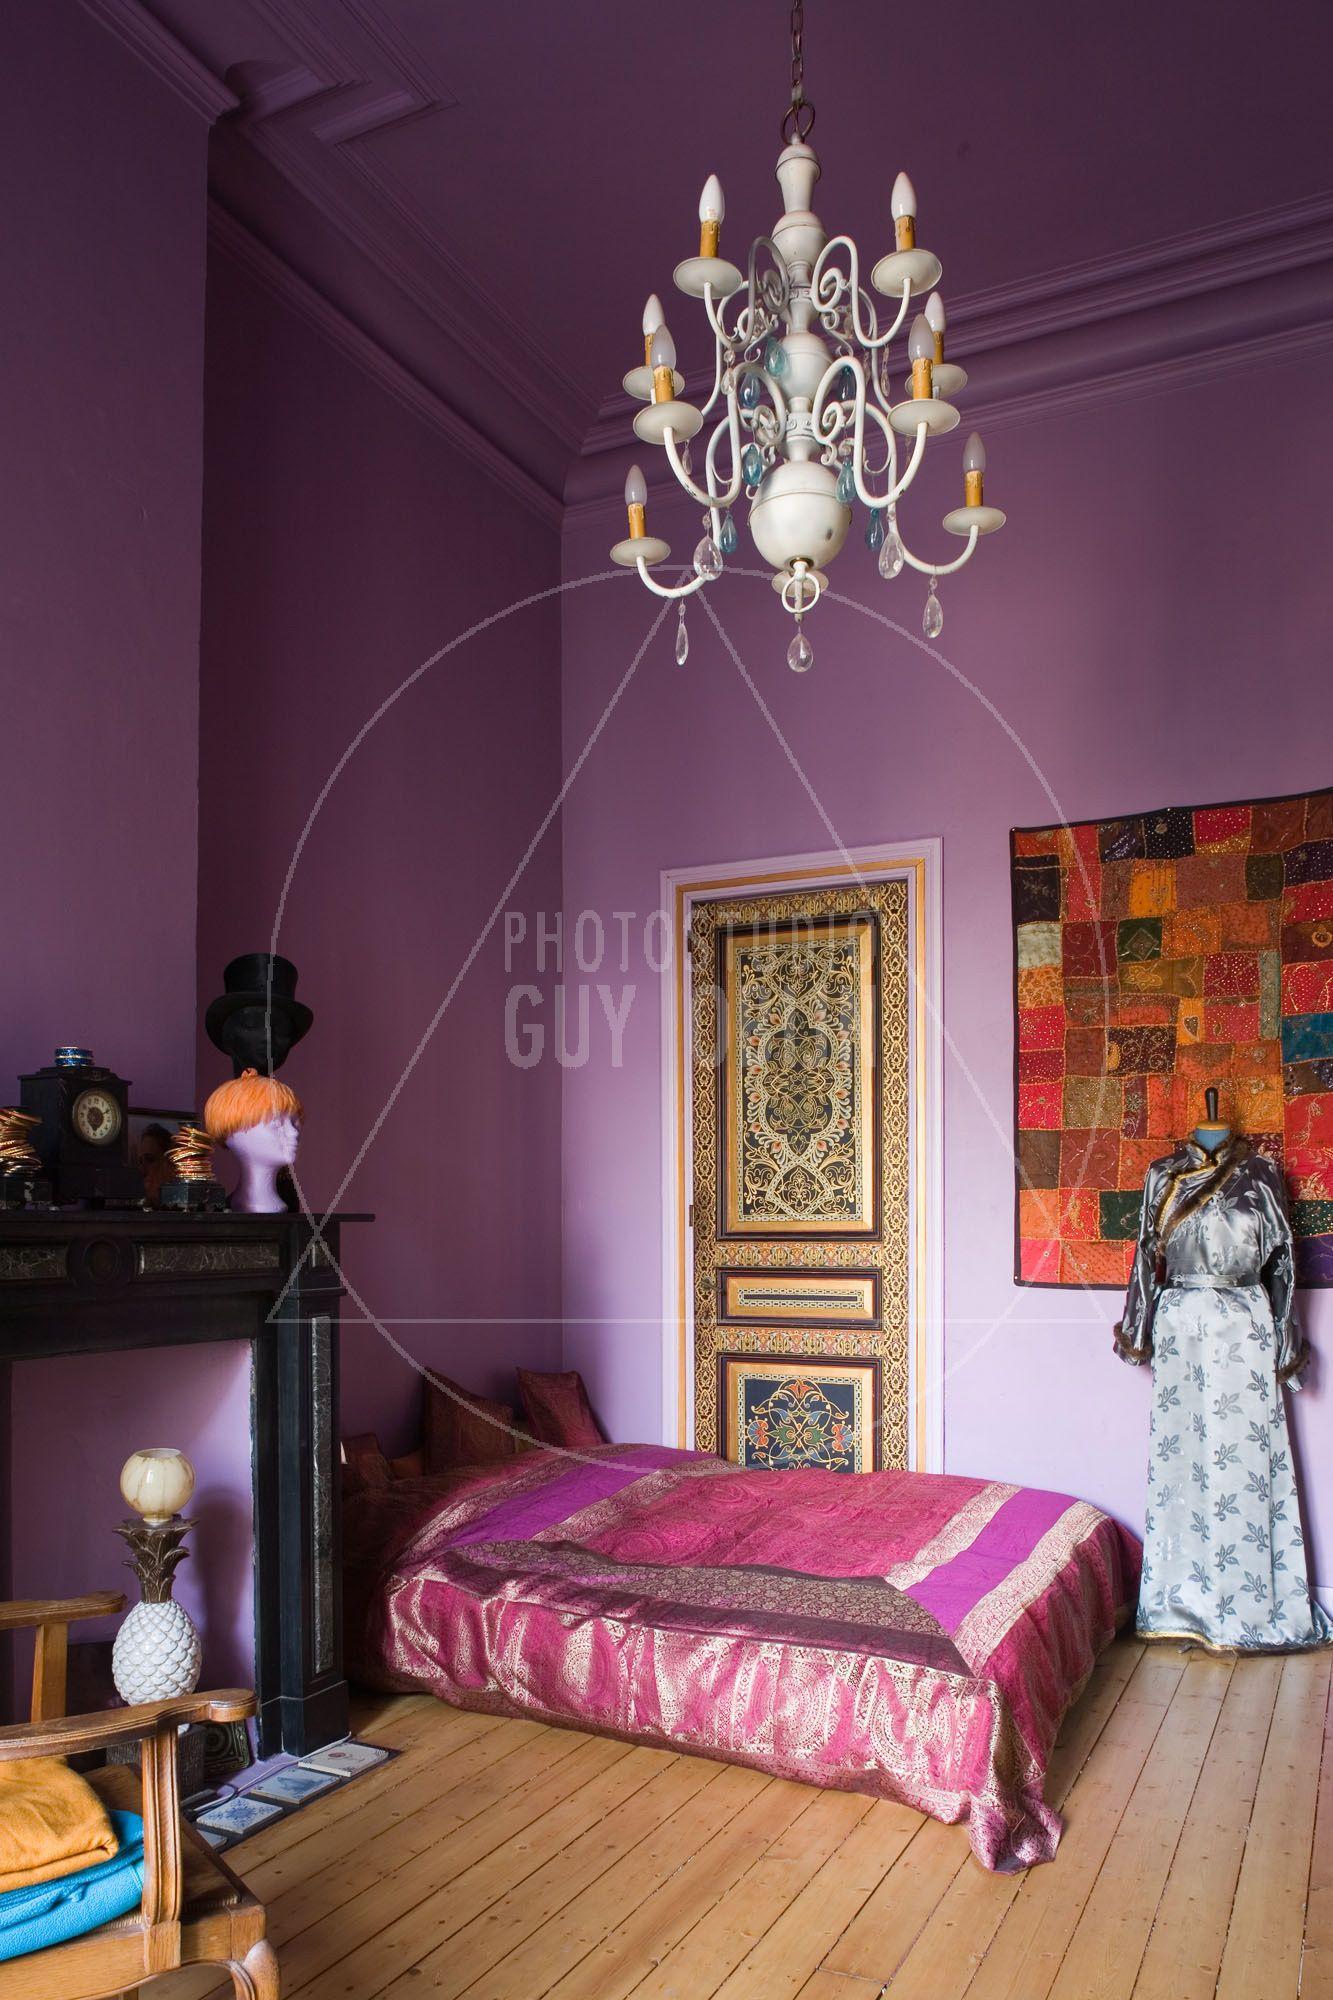 Arabic Bedroom Design Interesting Arabic Bedroom  Eccentric Interiors  Pinterest  Eccentric Design Decoration